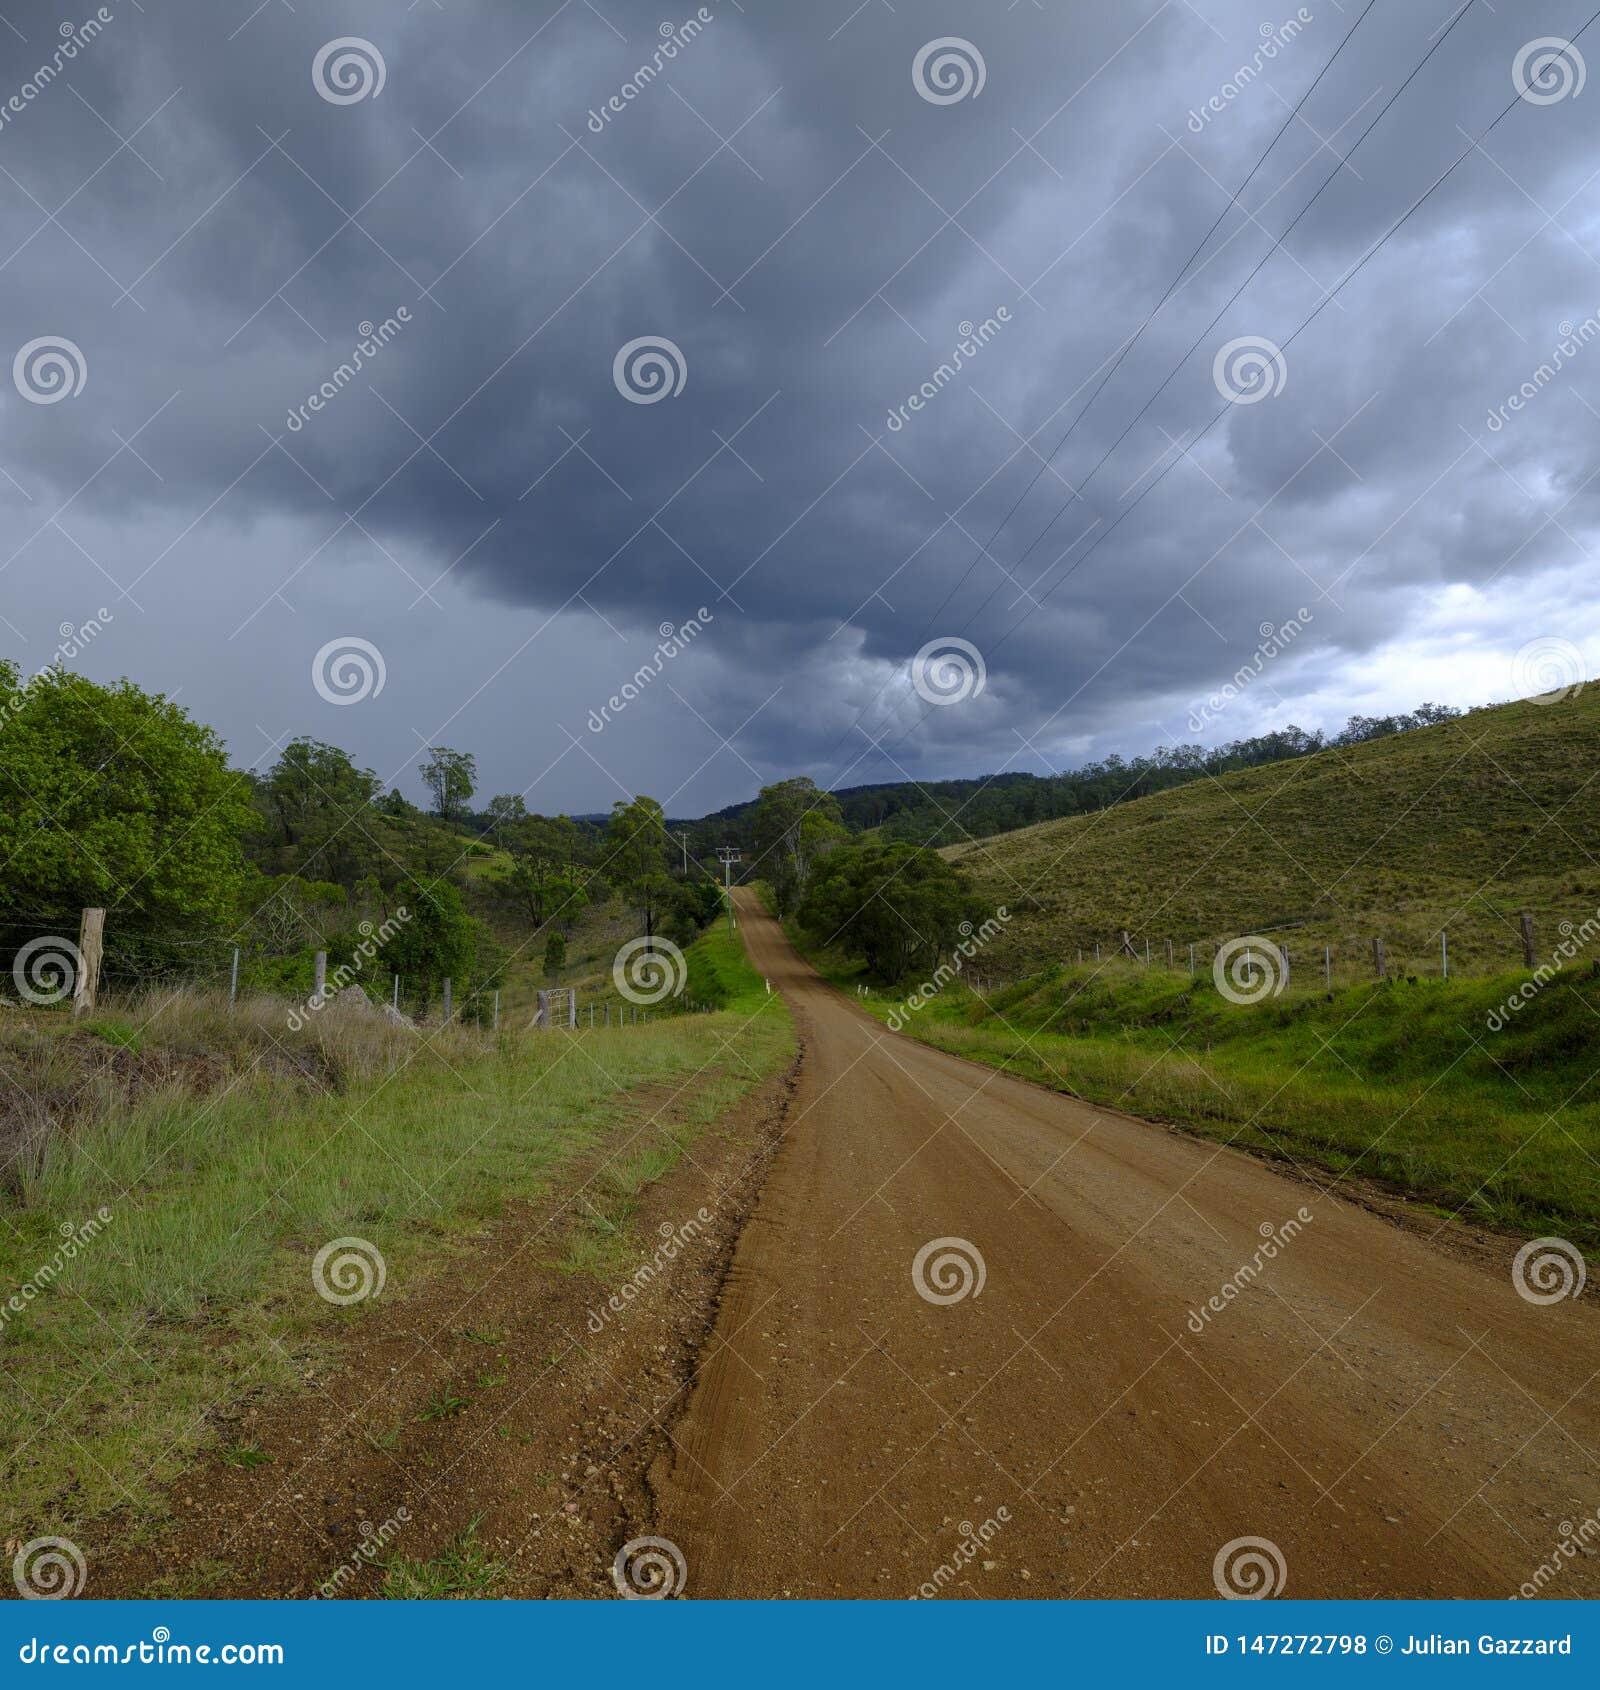 Views around Millfield and Cessnock in the Hunter Valley, NSW, Australia